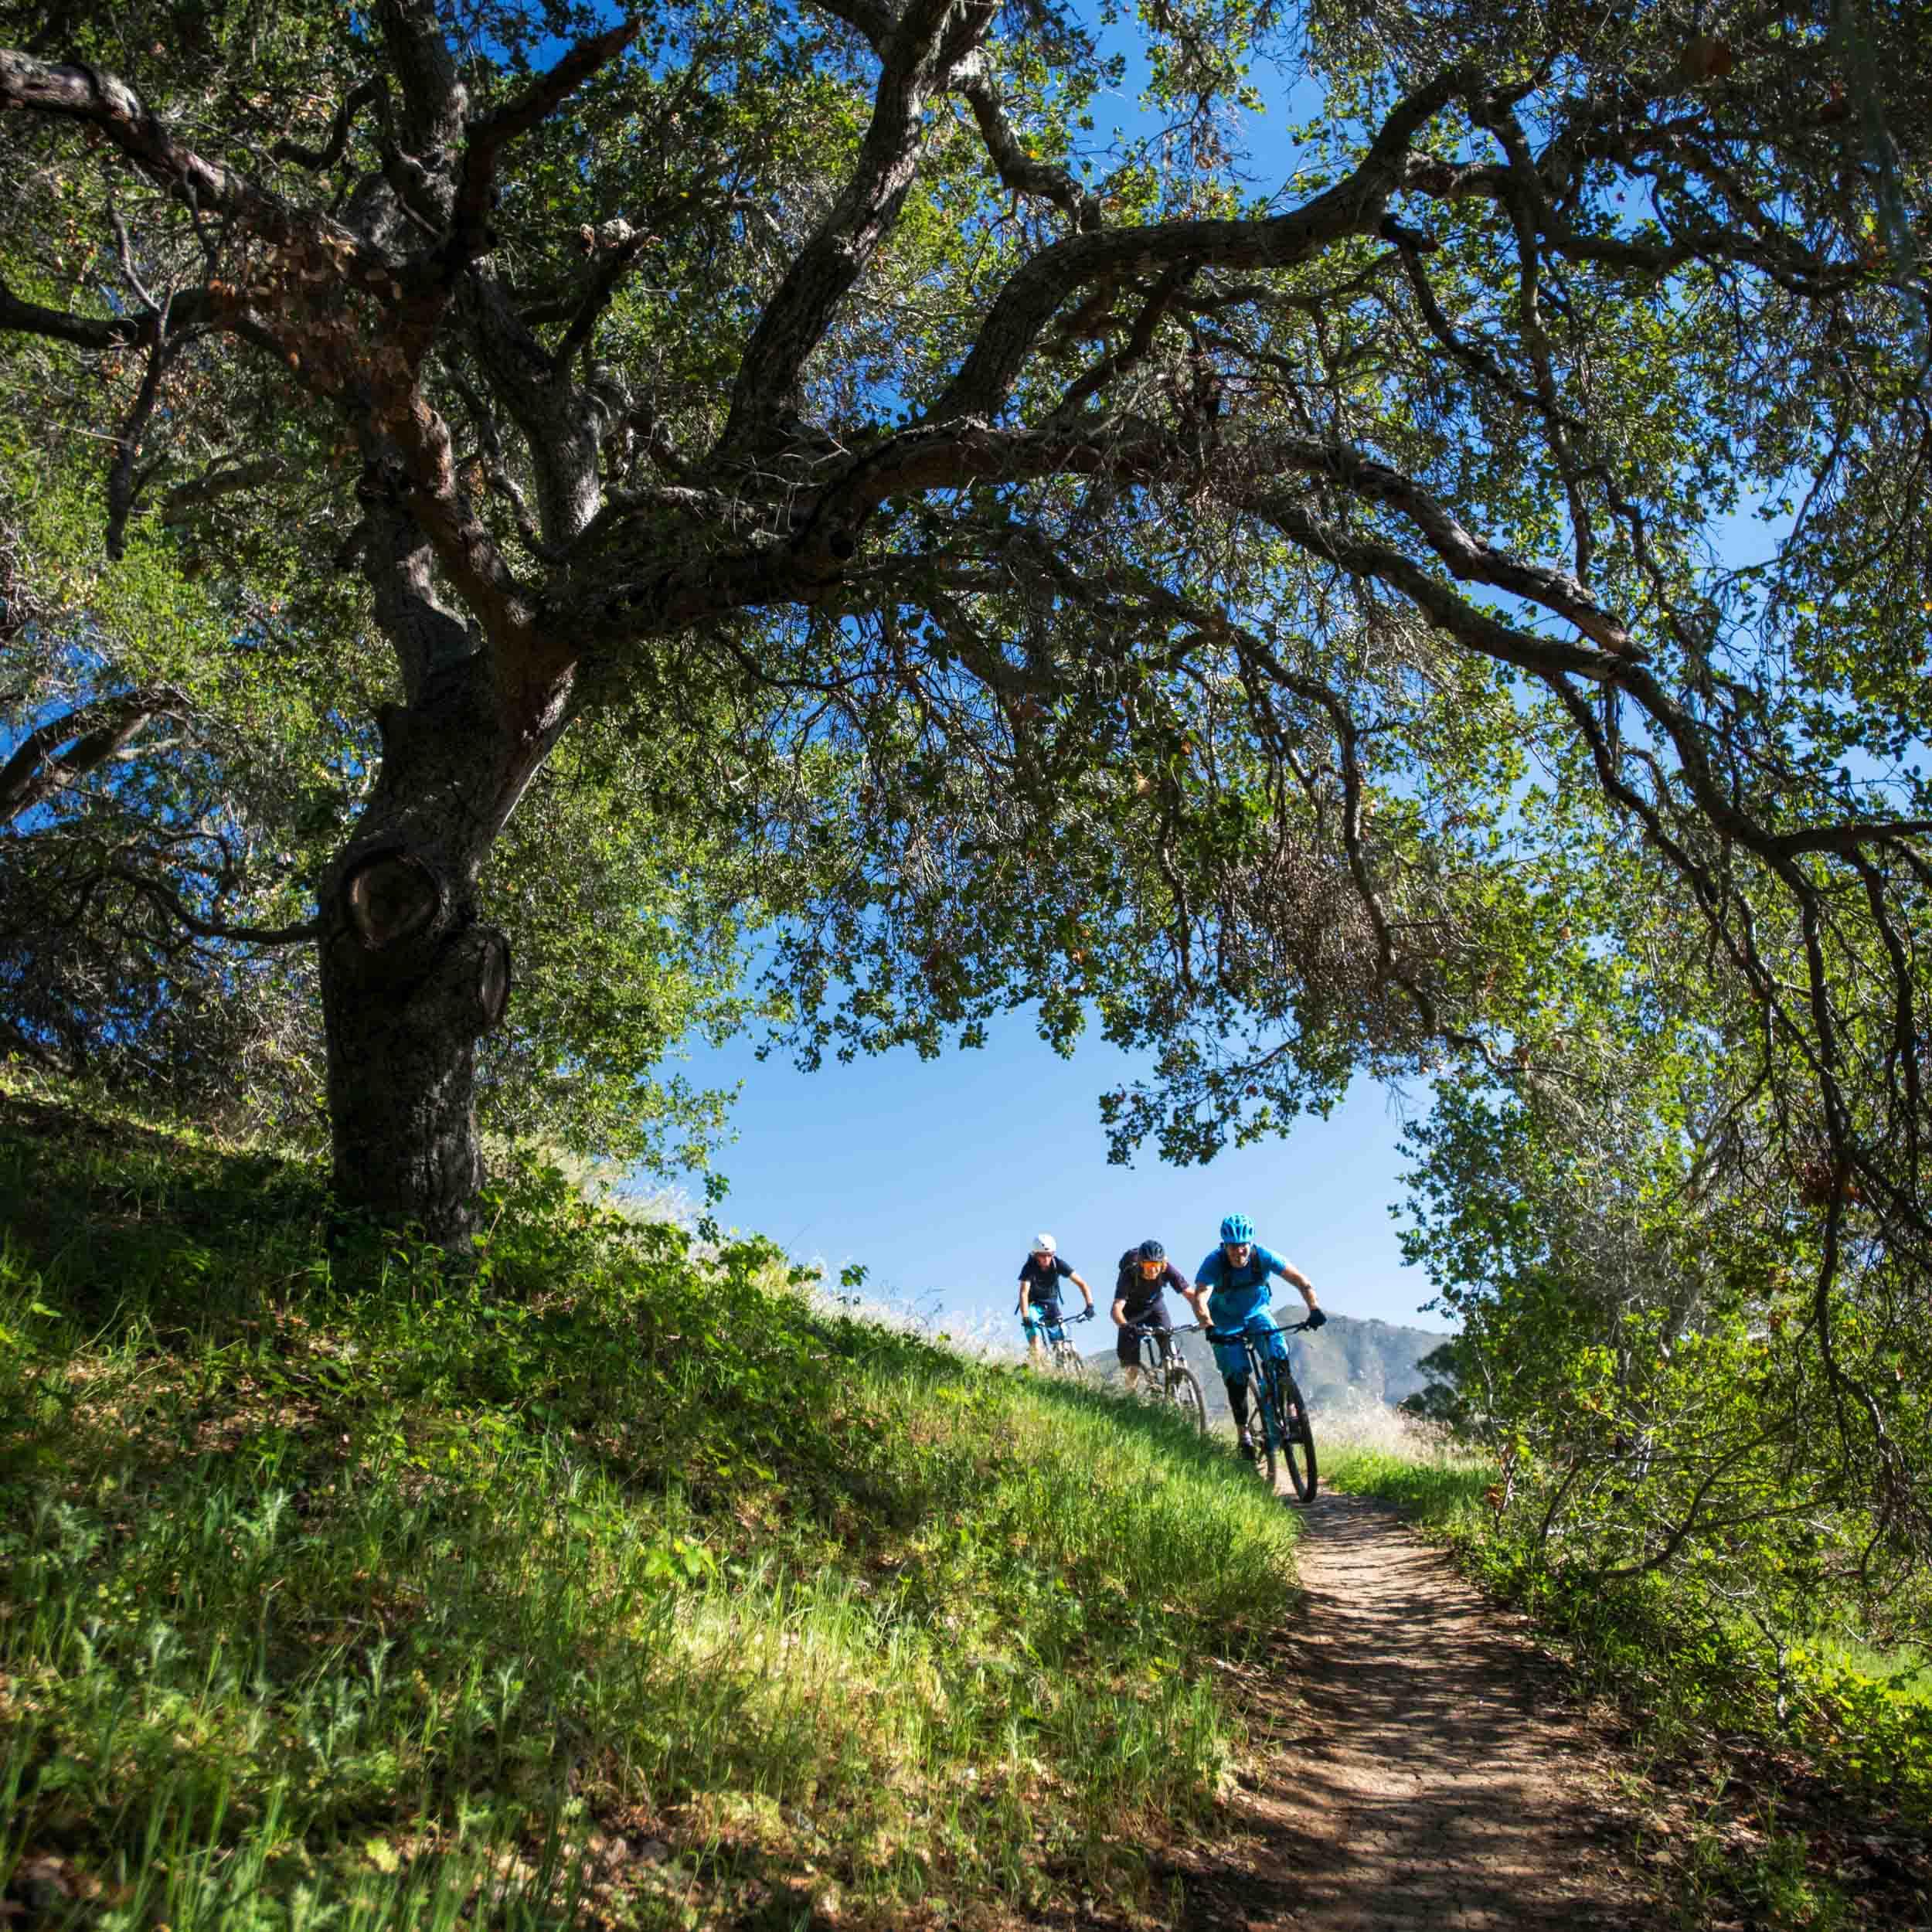 kman_cyclery_tree_trail_mtb_crop_w.jpg